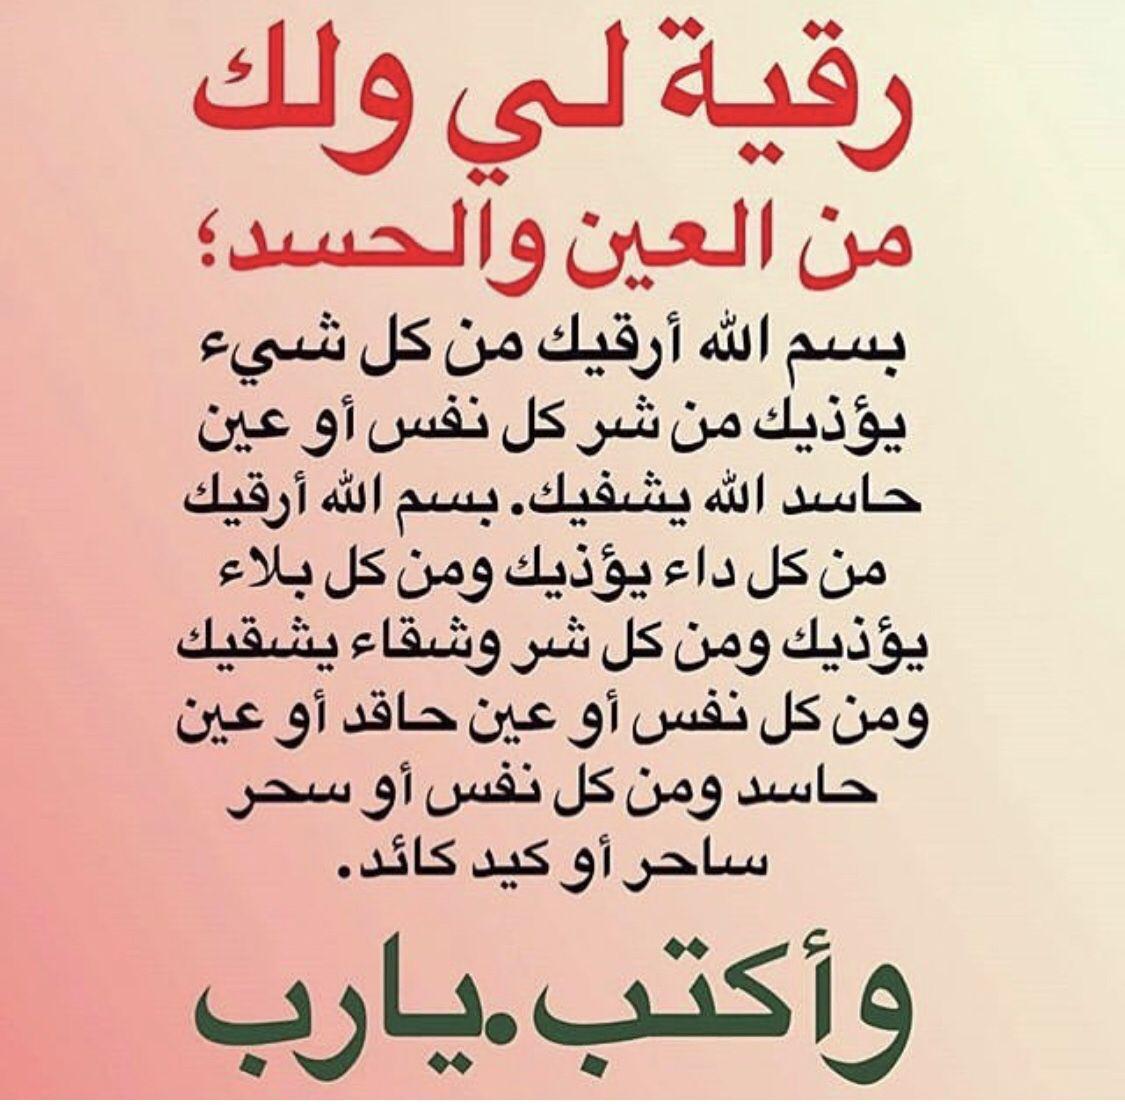 Pin By Hend Abd El Ghaffar On Islam Quran Quran Quotes Inspirational Islamic Love Quotes Islamic Inspirational Quotes